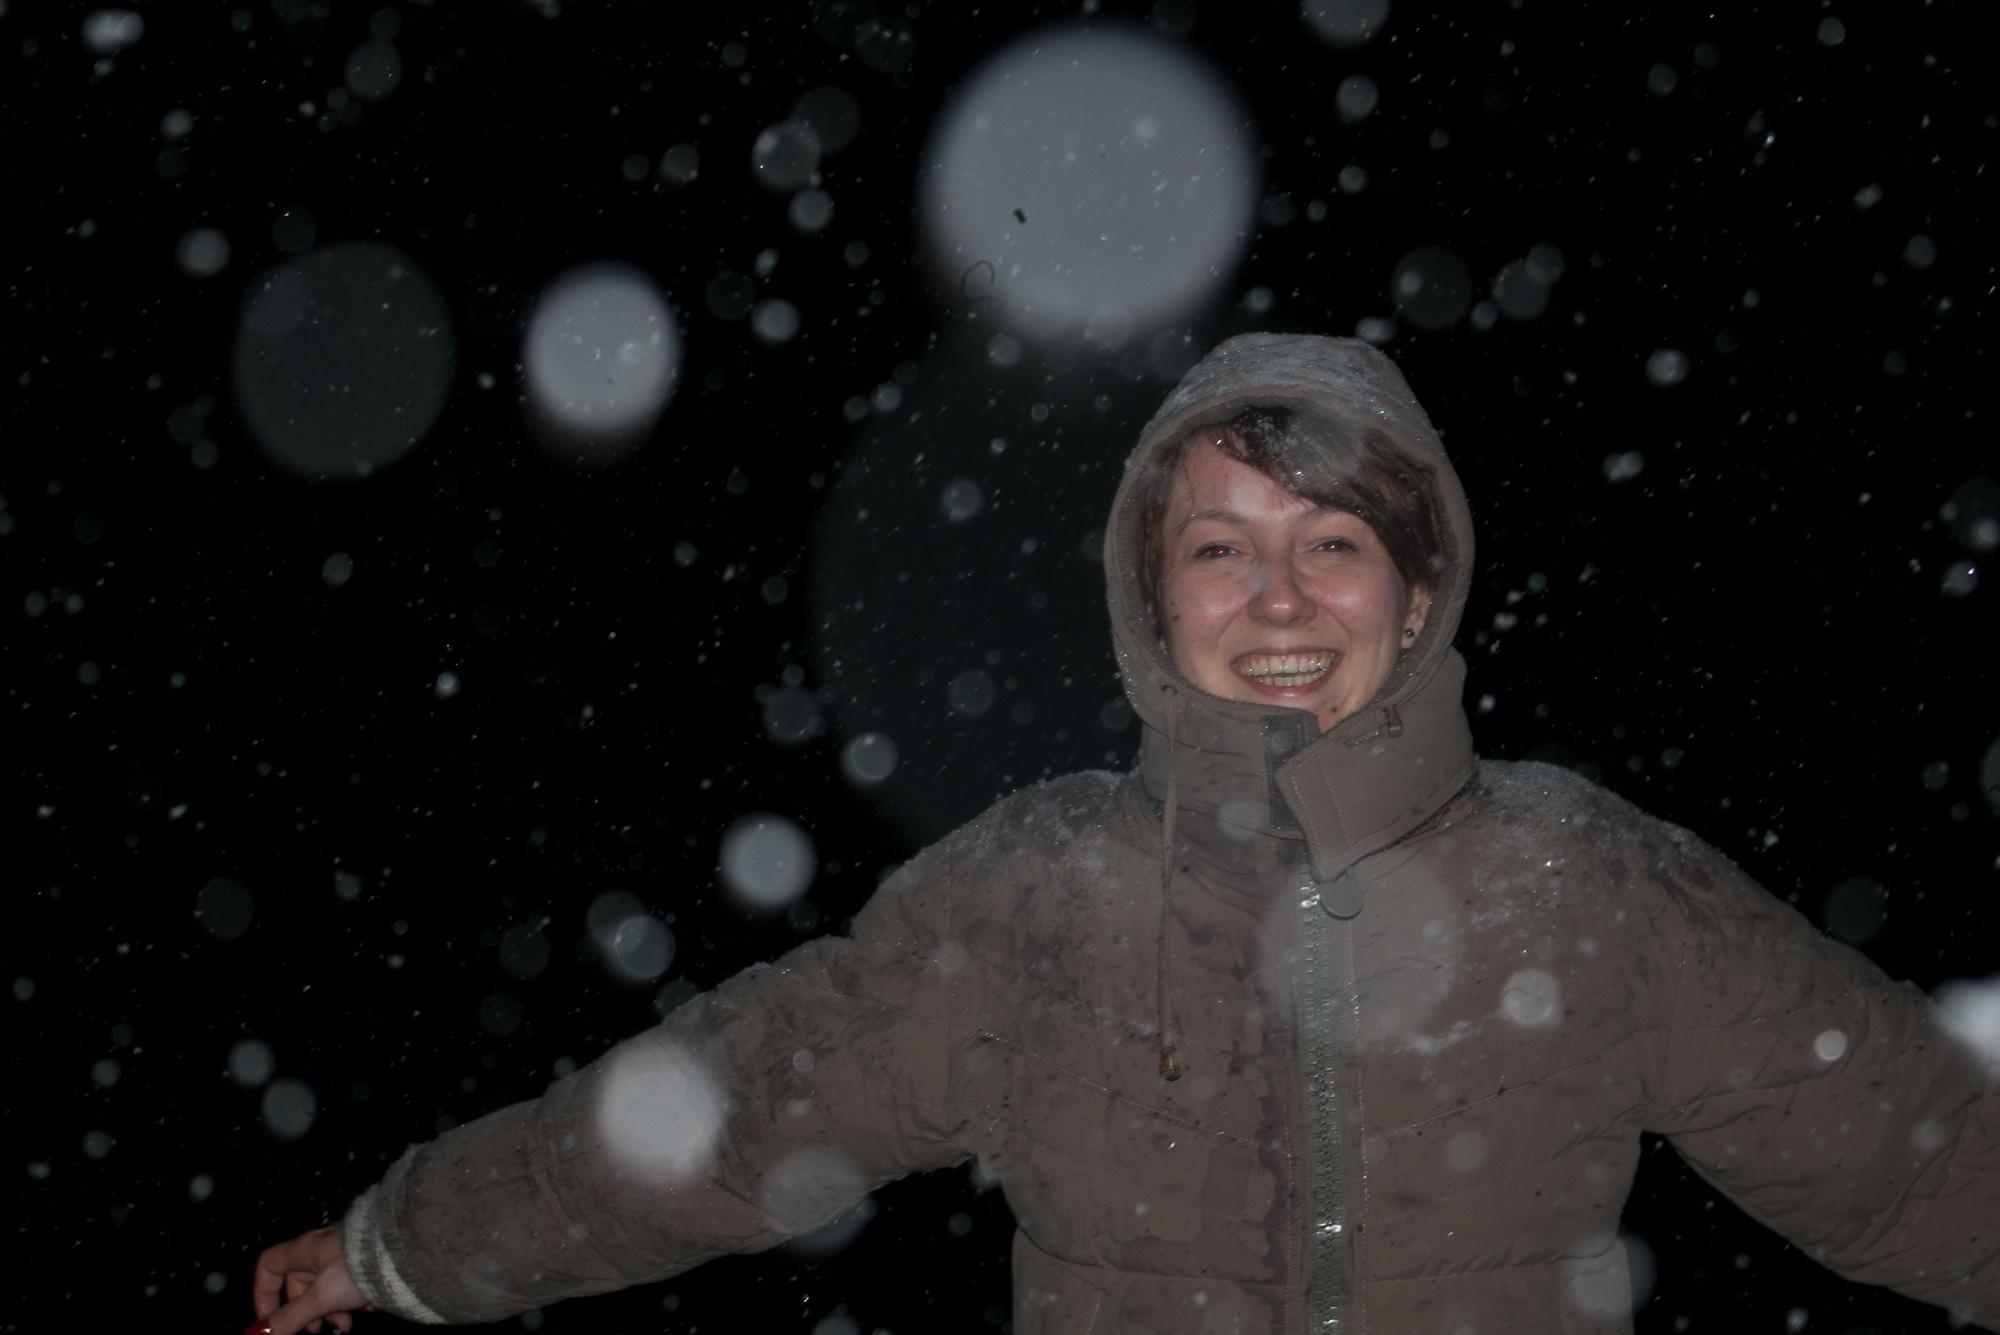 Nebuloasa in ninsoare